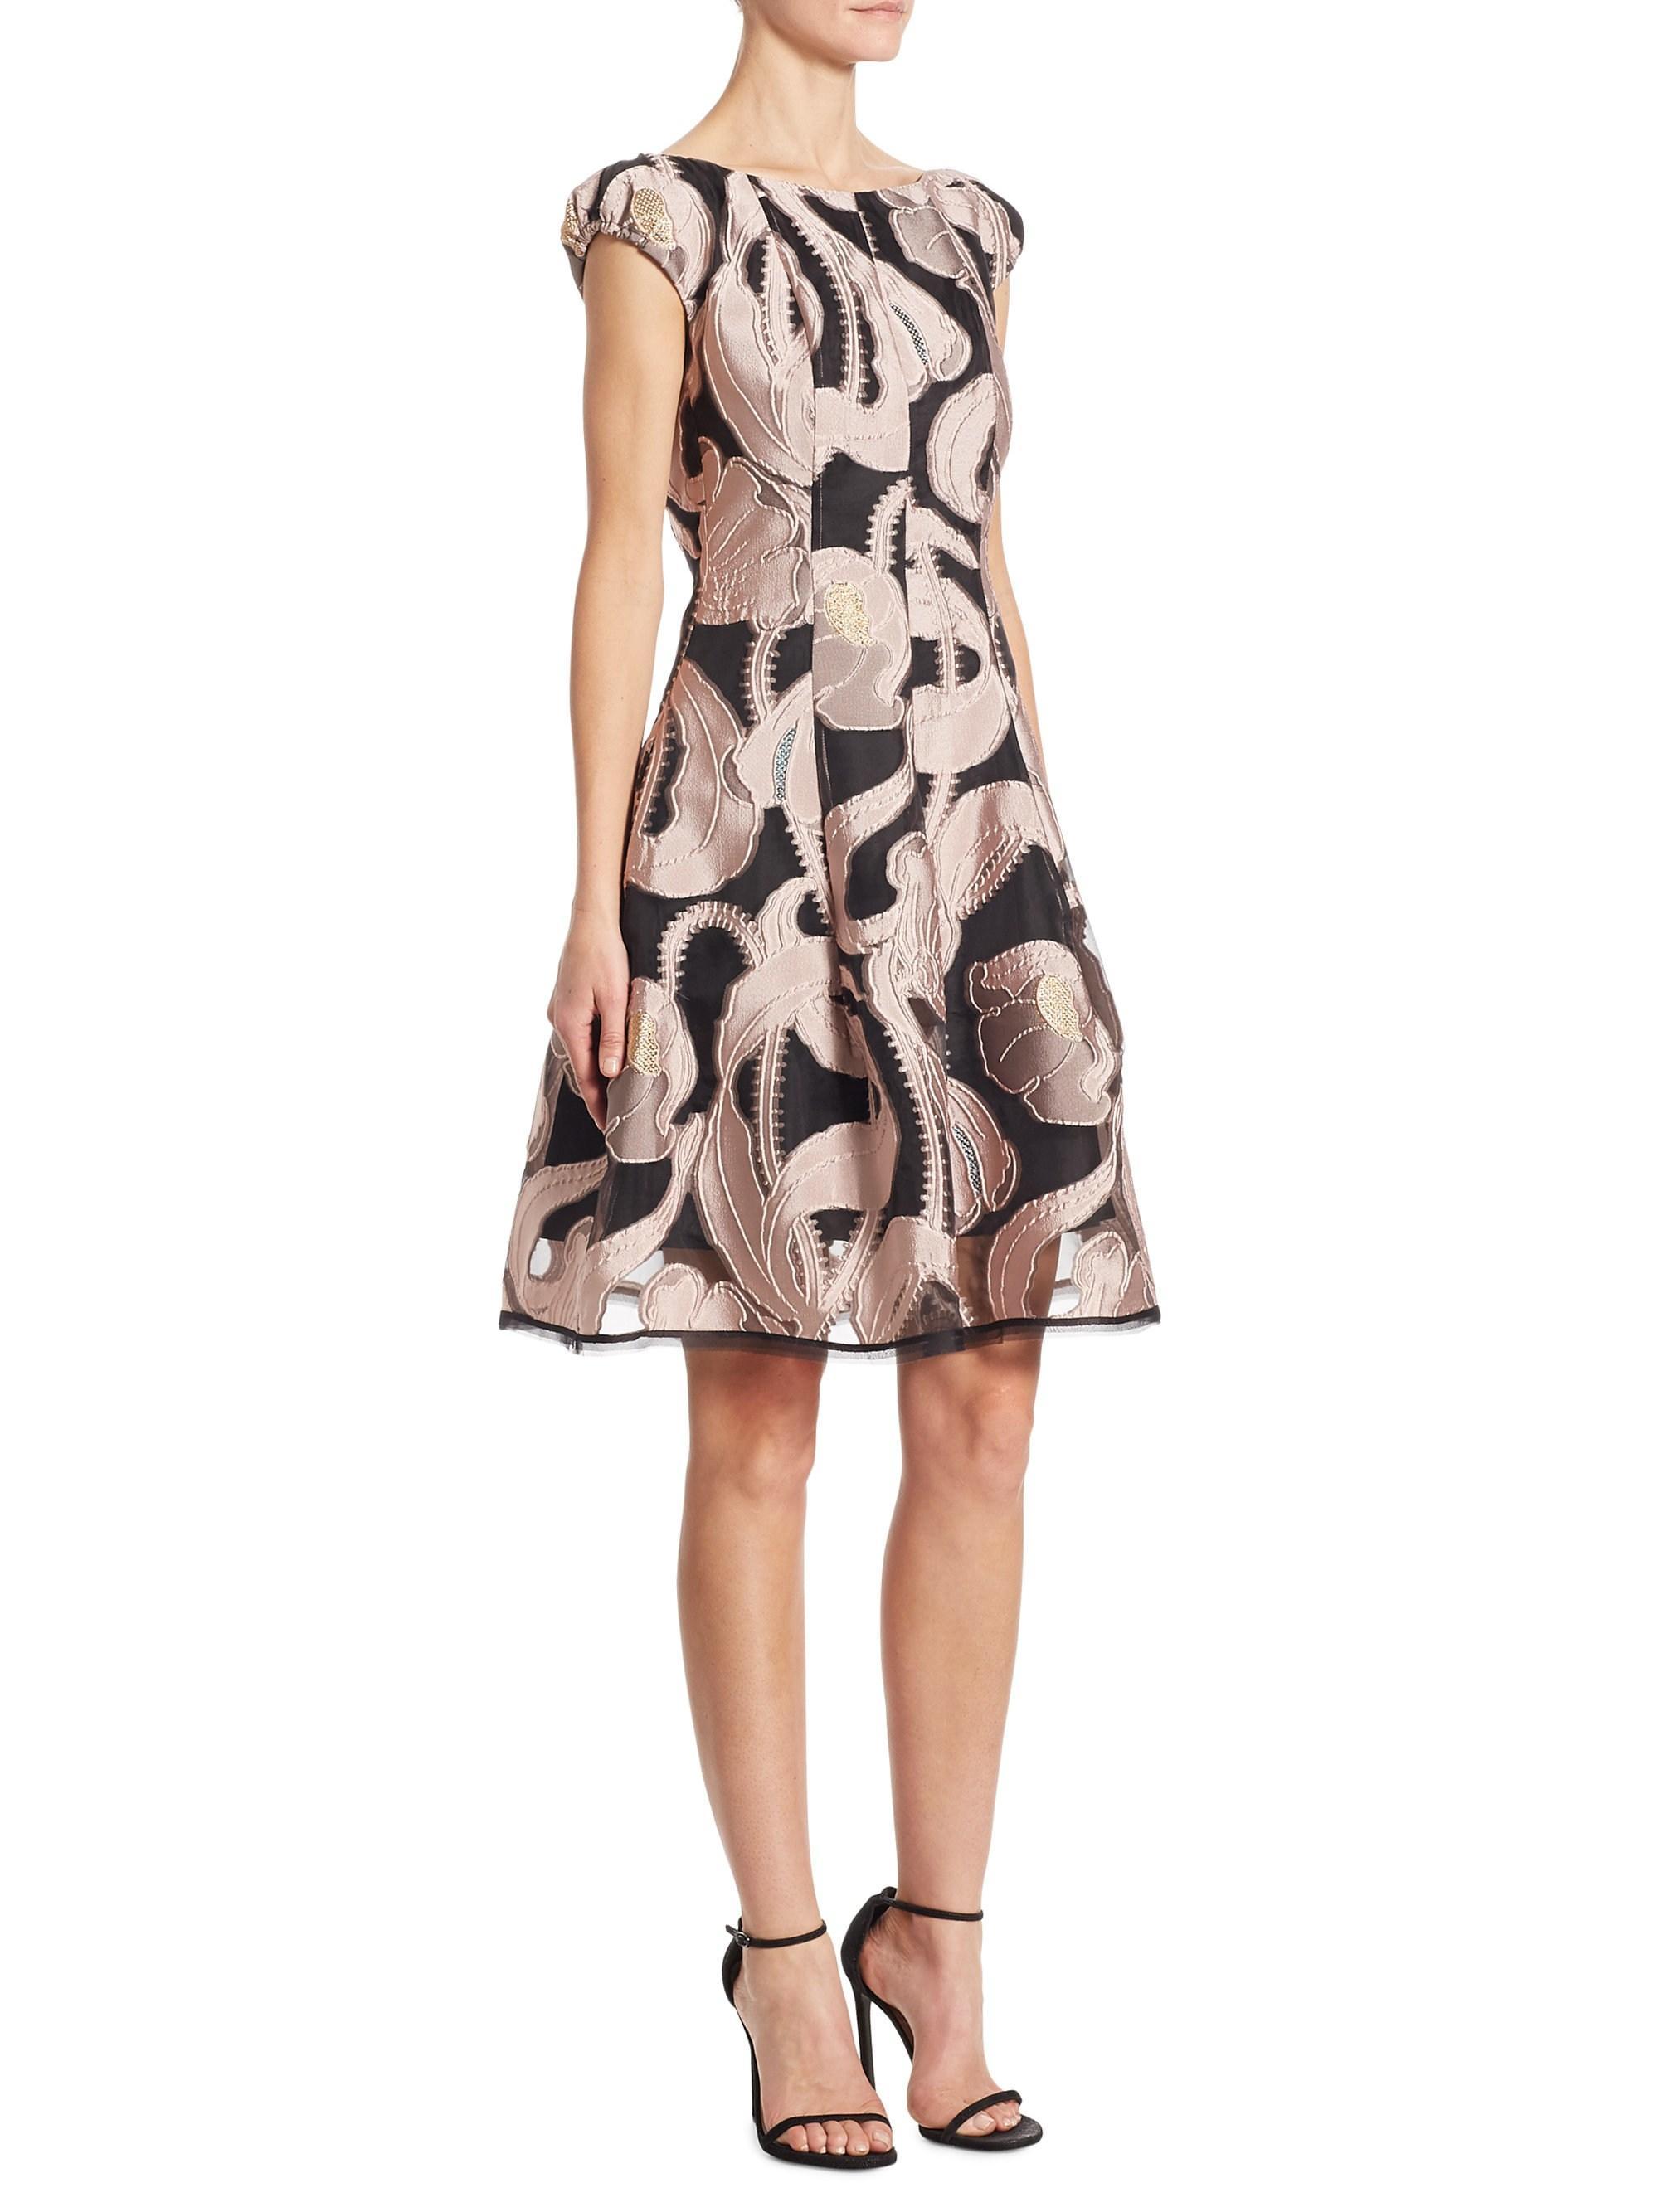 1a3e6154859 Lyst - Talbot Runhof Silk Marble-print Dress